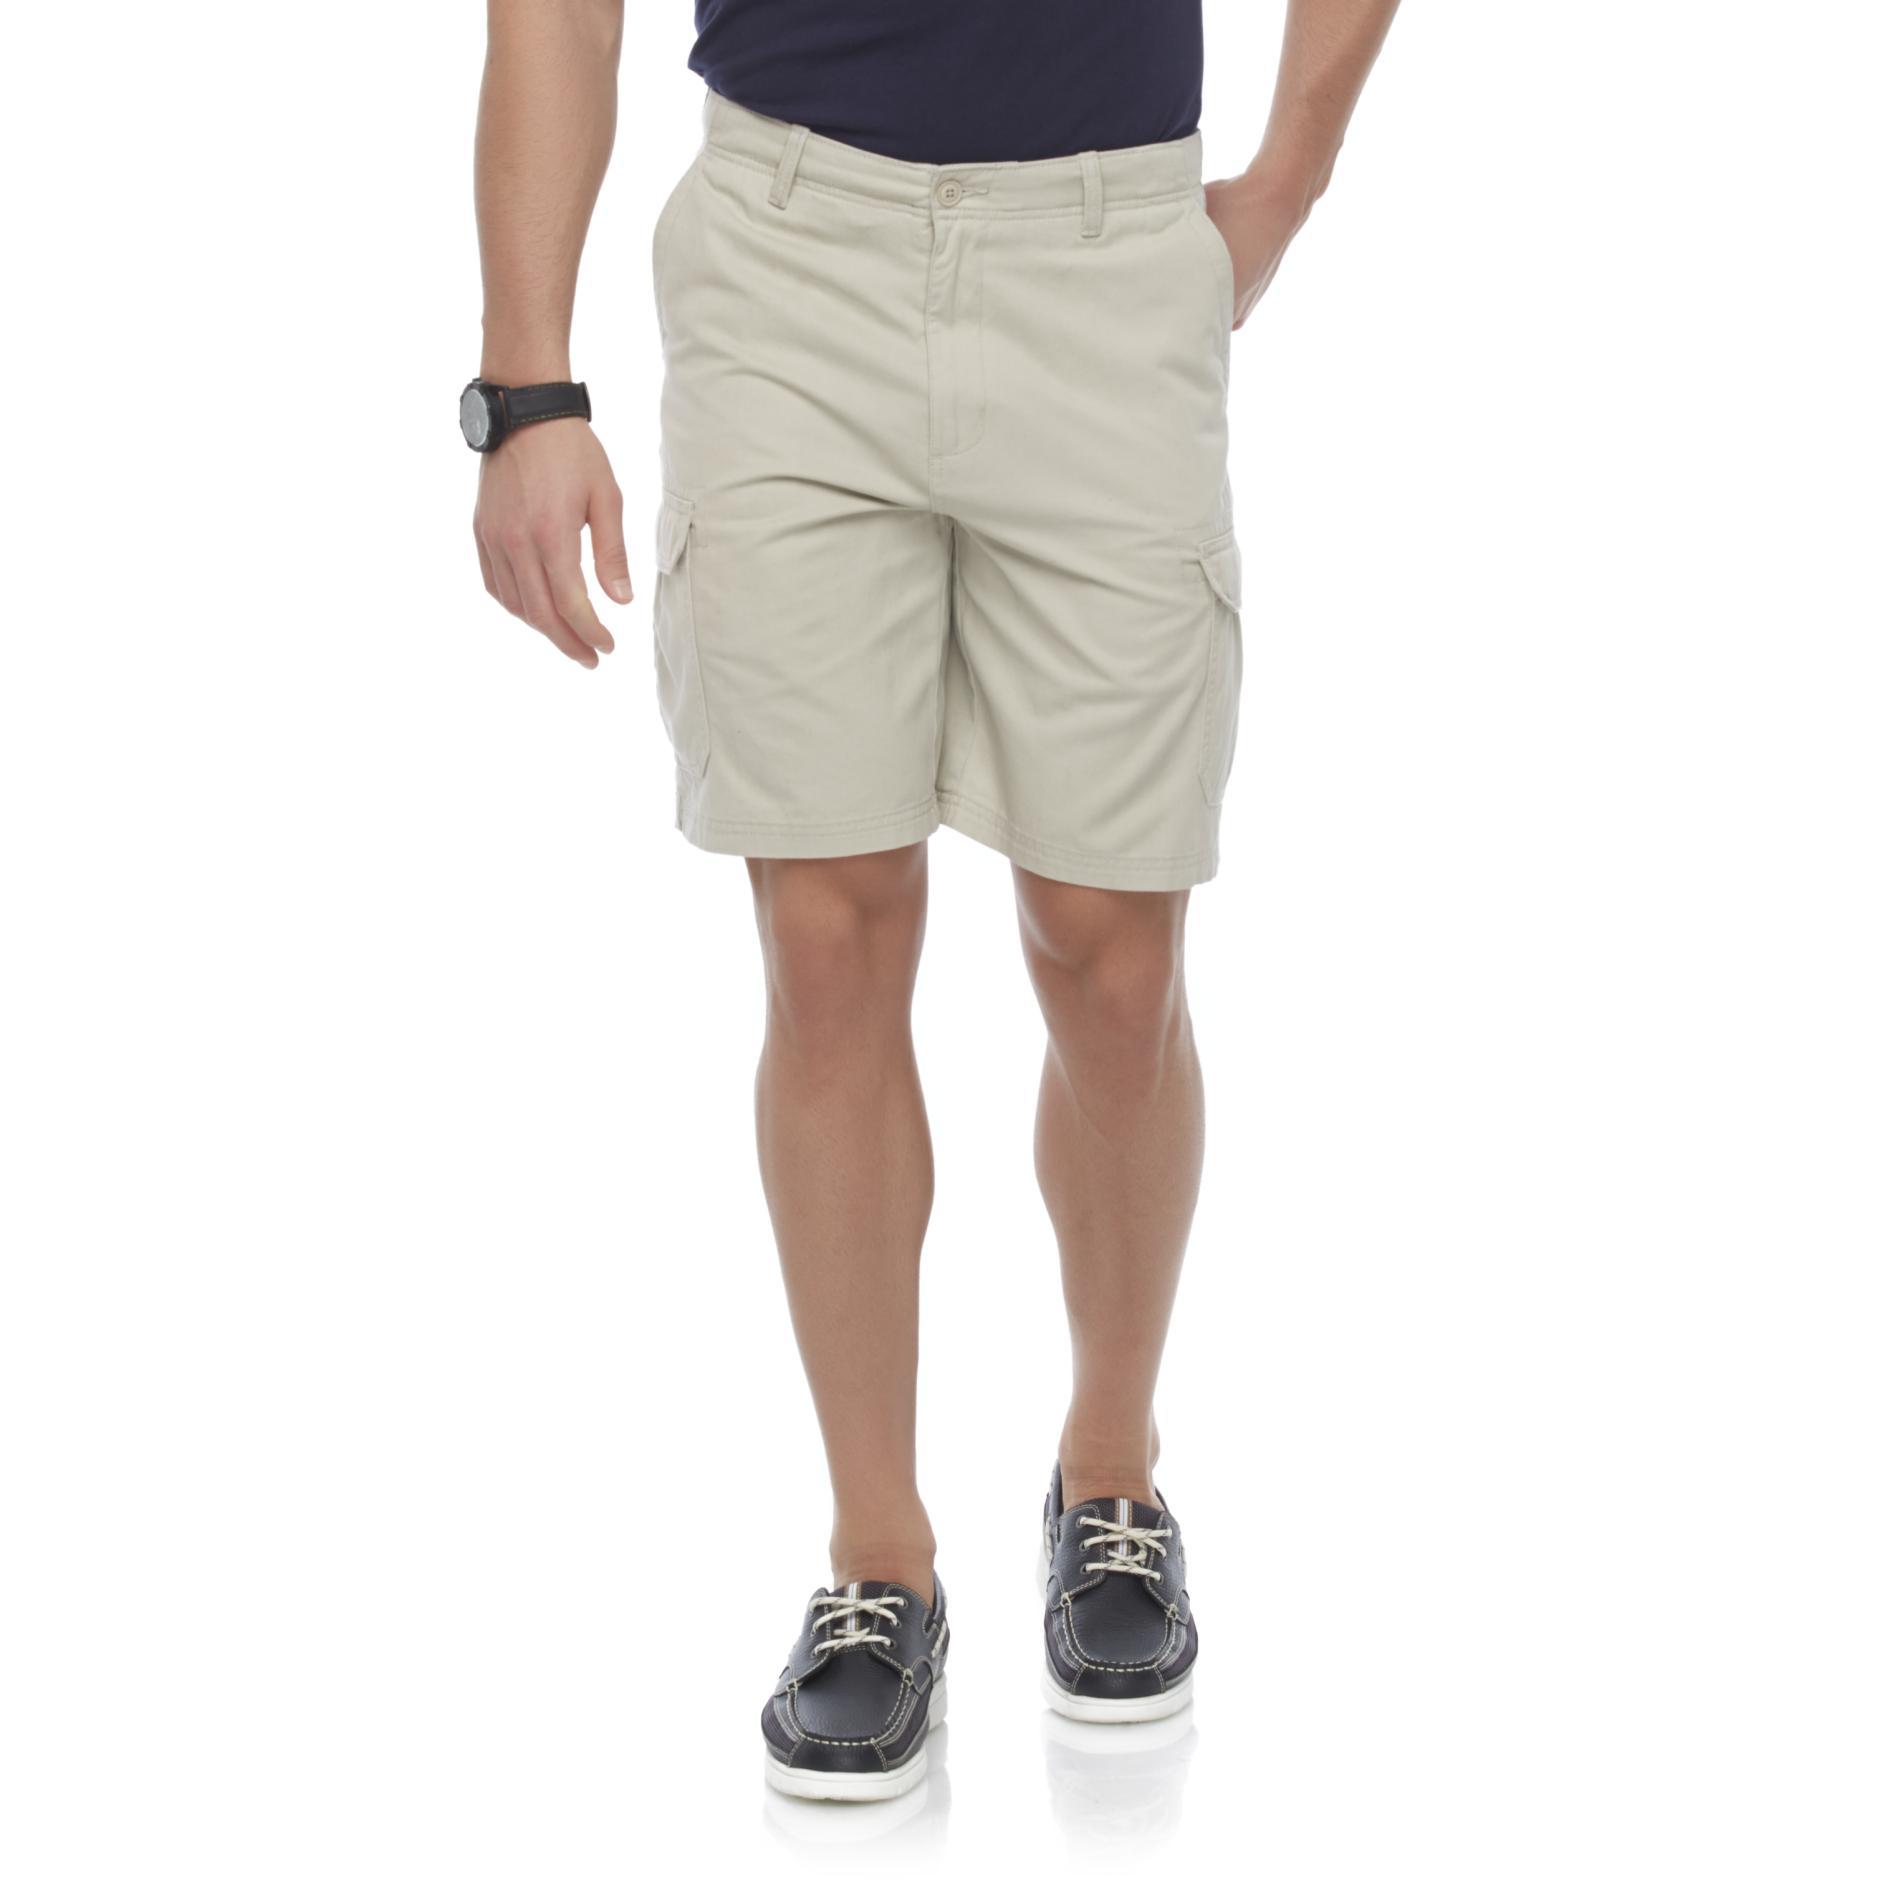 Covington Men's Cargo Shorts